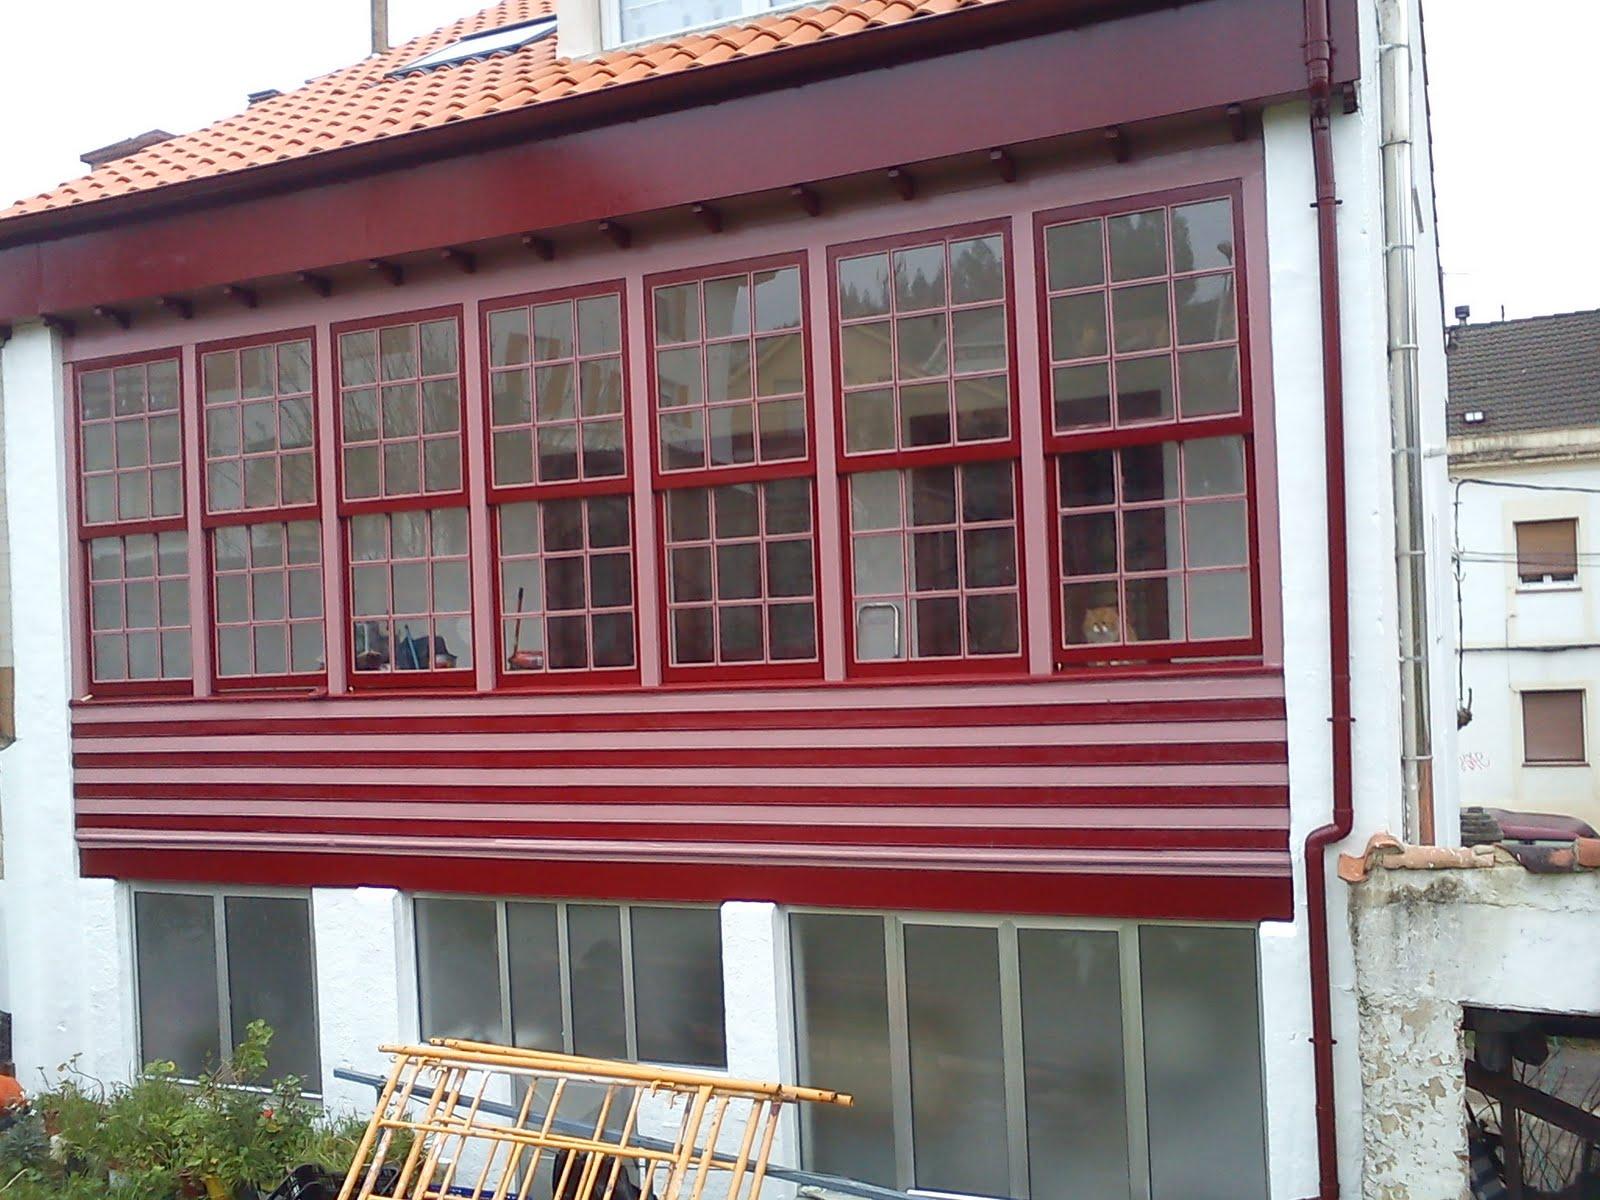 Pinturas pablo pintura exterior de un corredor en luanco - Pinturas de exterior ...